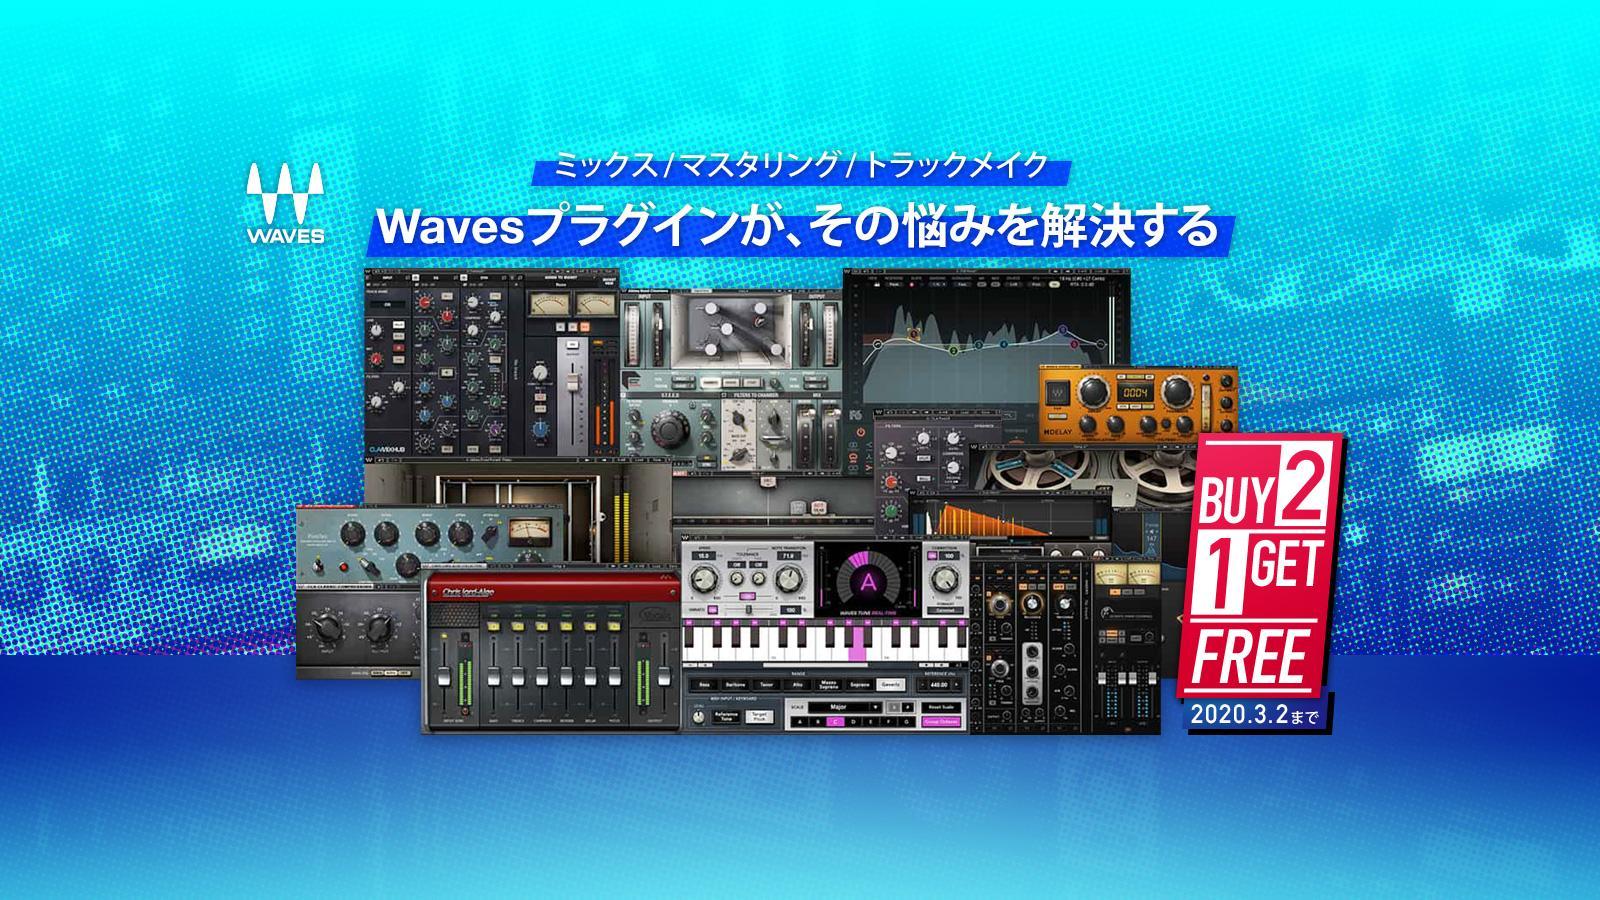 Wavesプラグインが無料でもらえる<br>Buy 2, Get 1 FREE!Waves February Super Sale